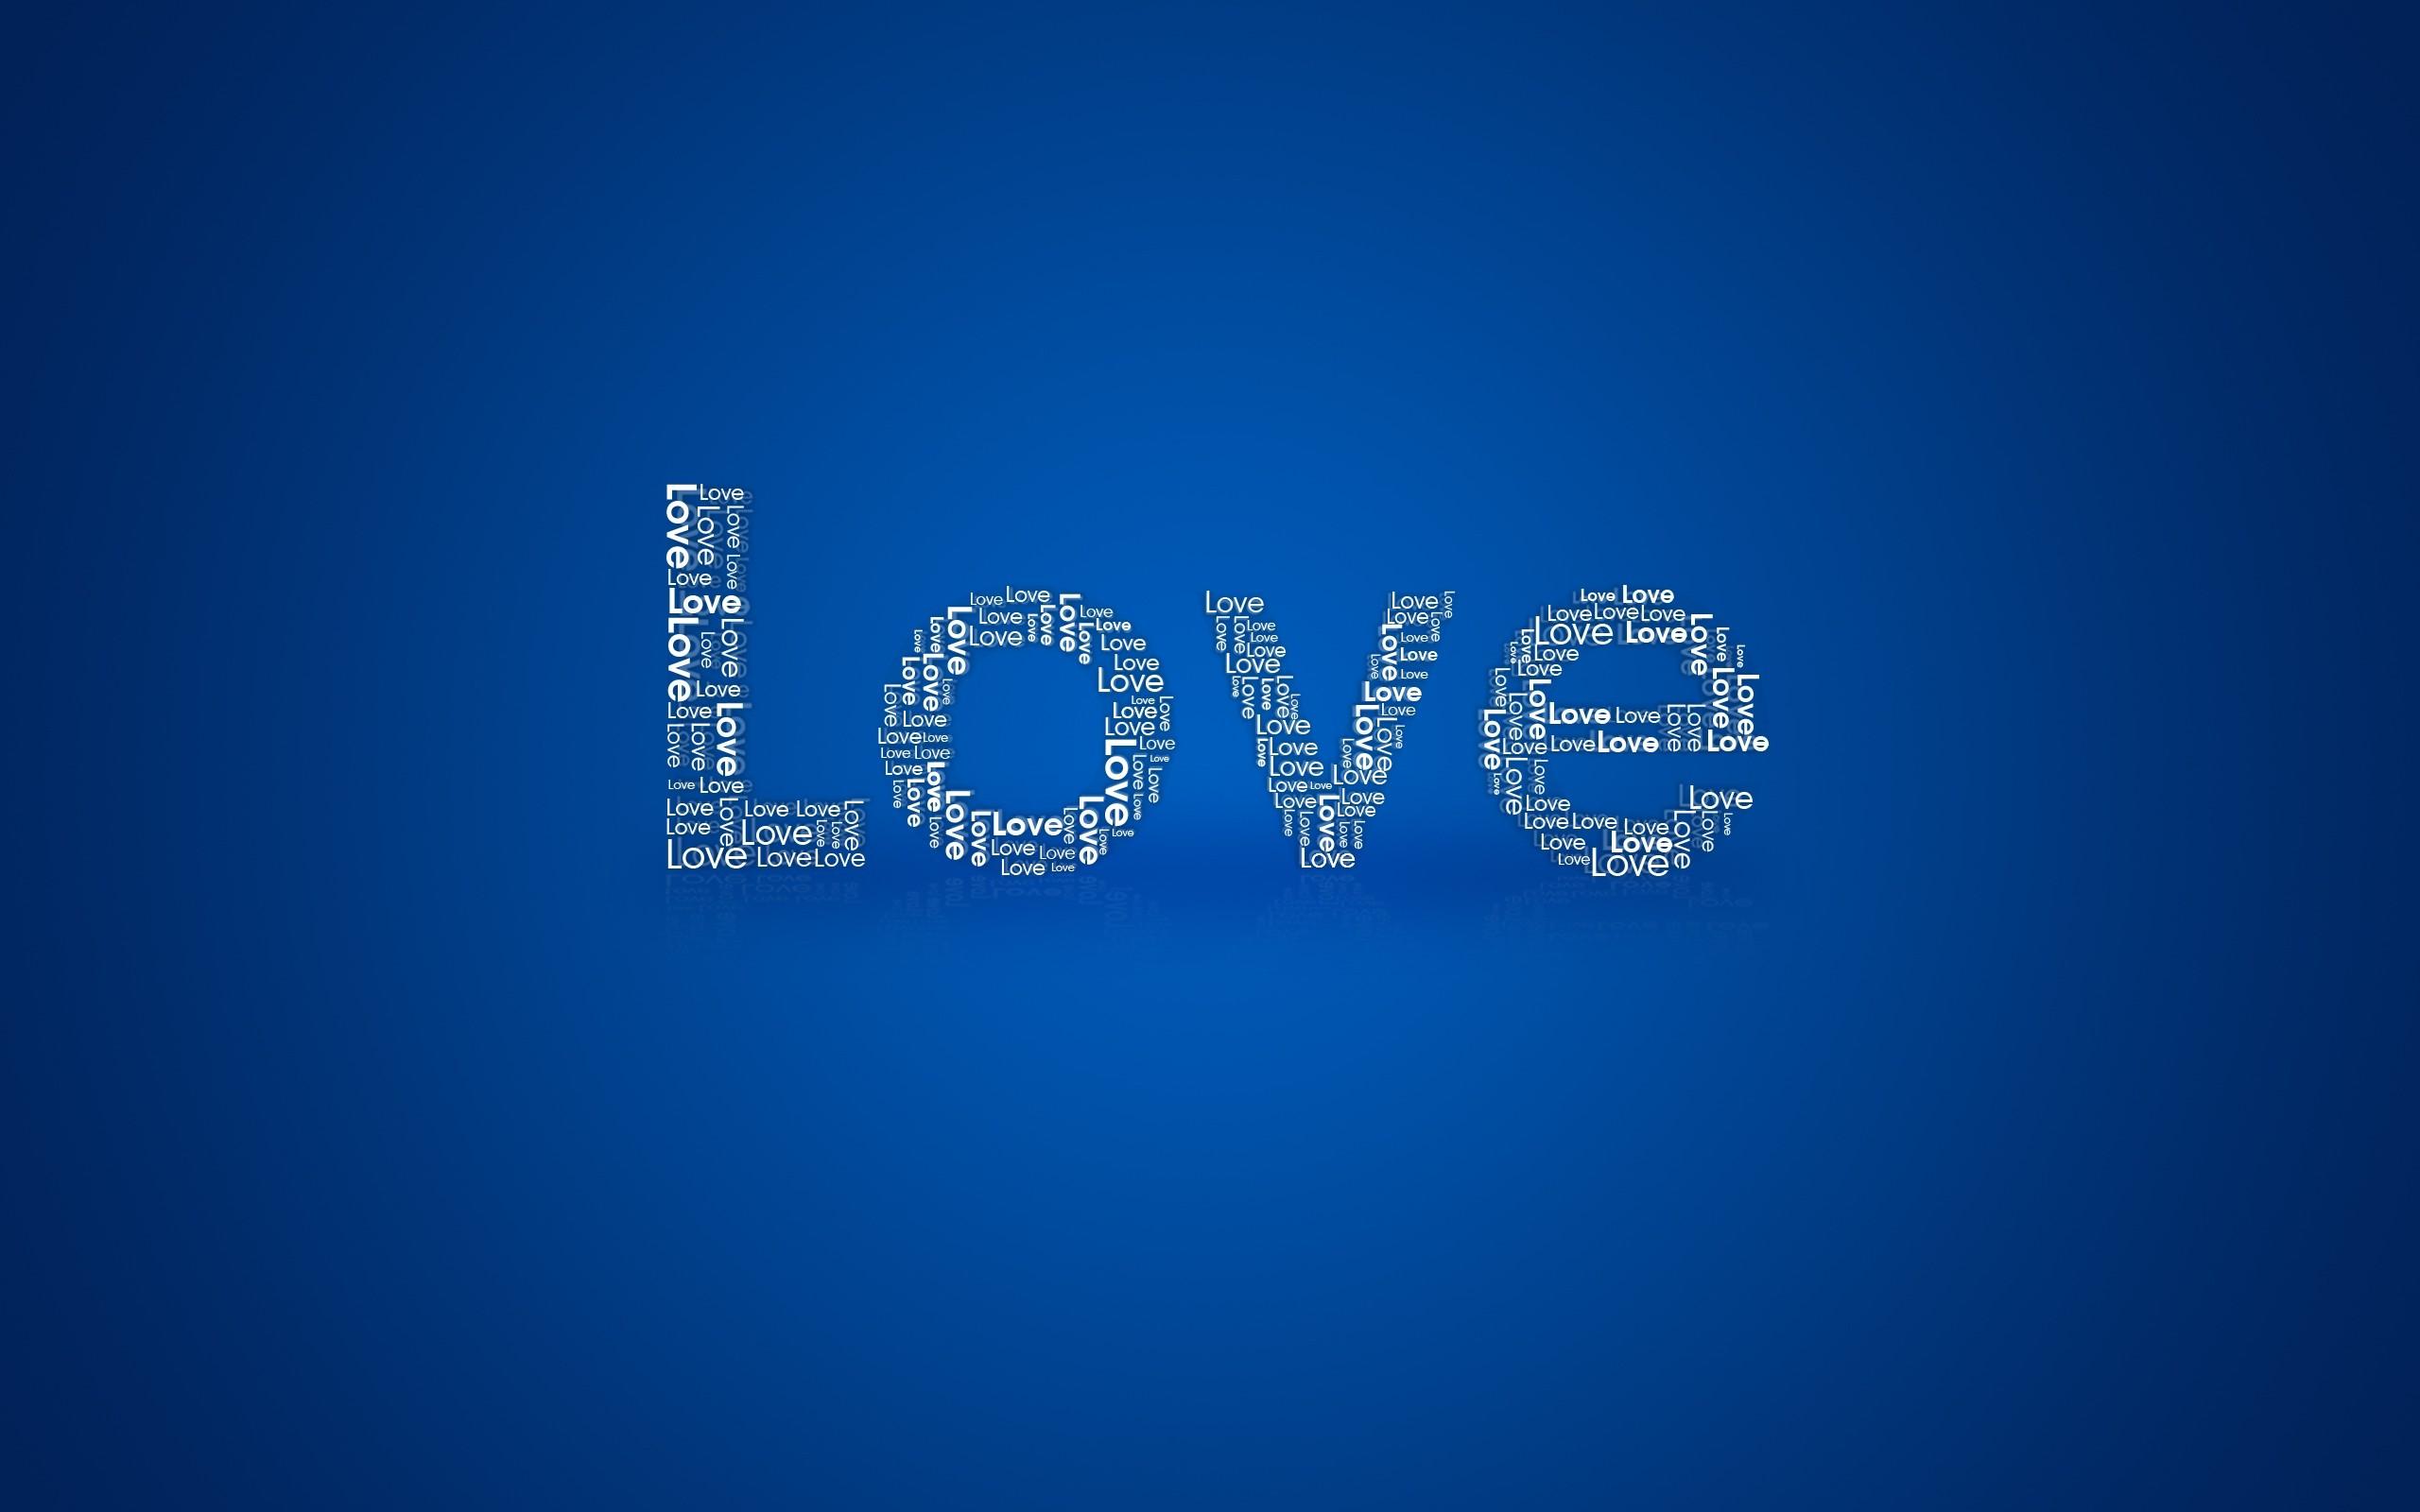 General 2560x1600 love blue background typography simple background digital art